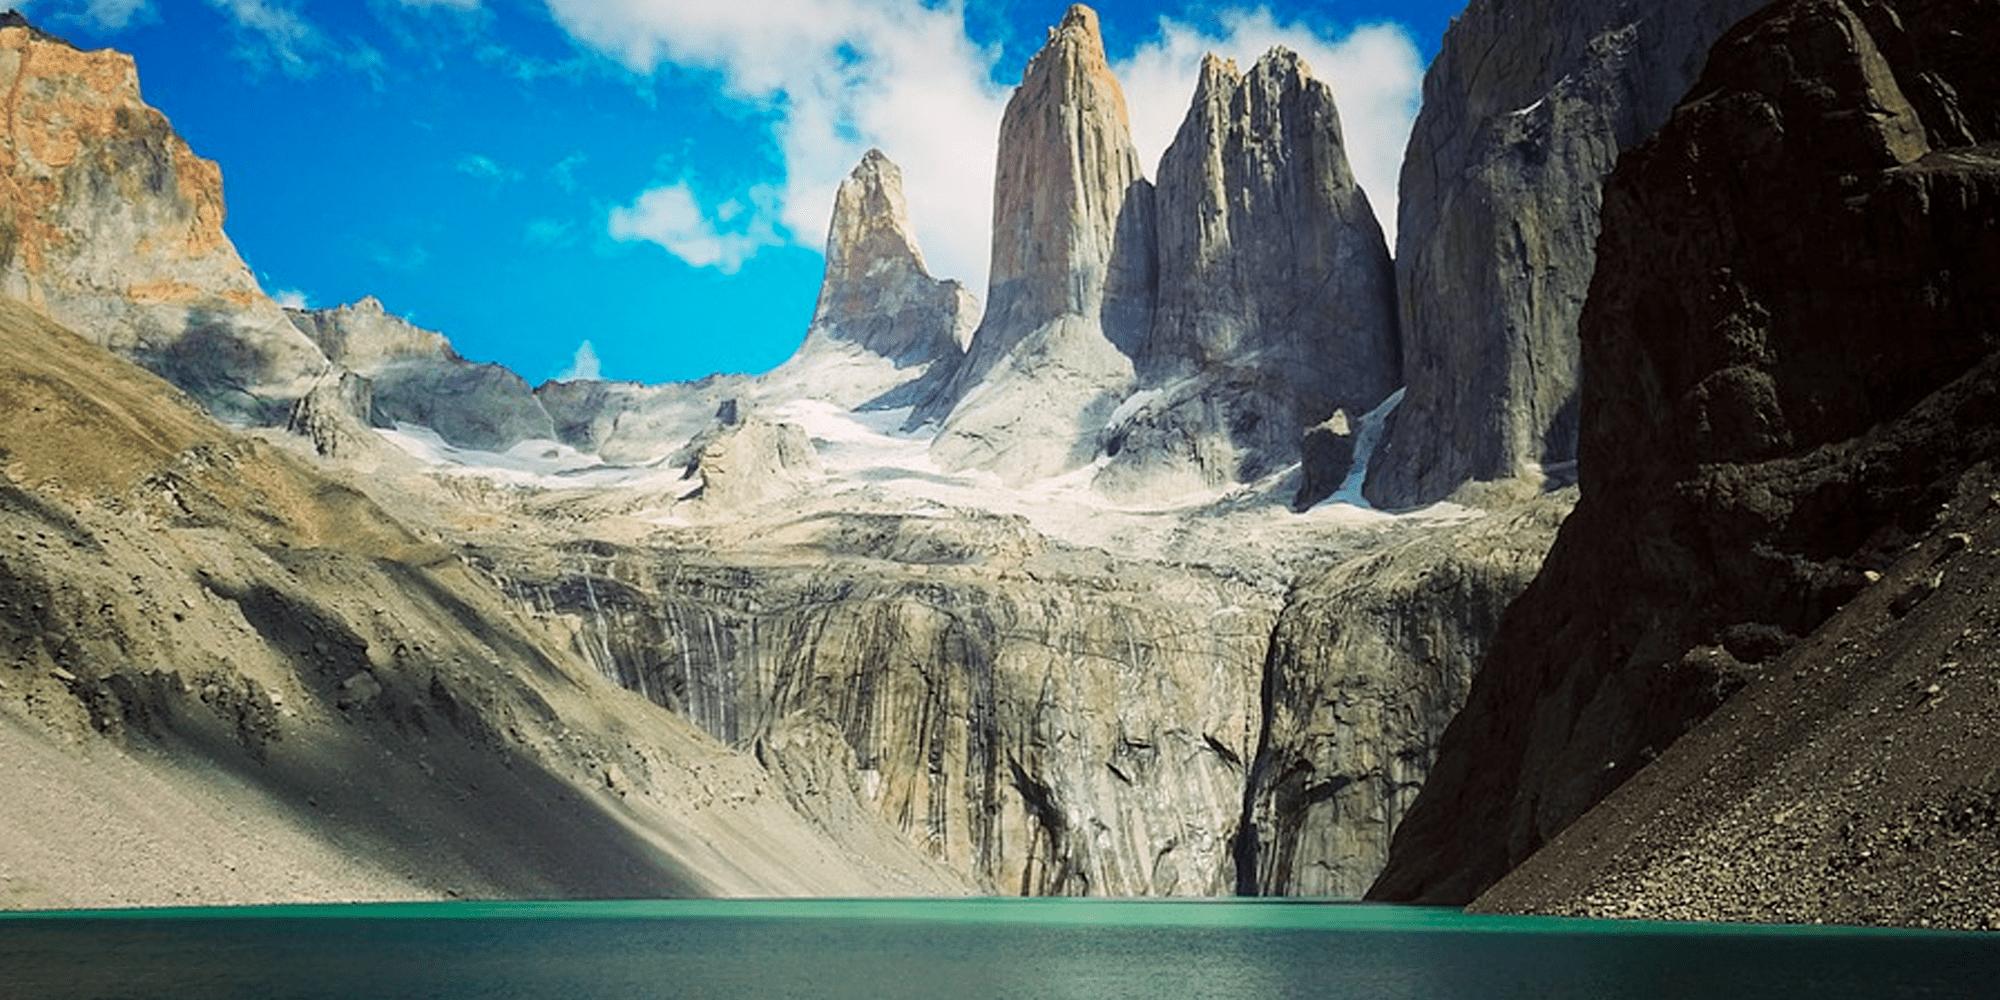 Torres del Paine: a fascinante patagônia chilena